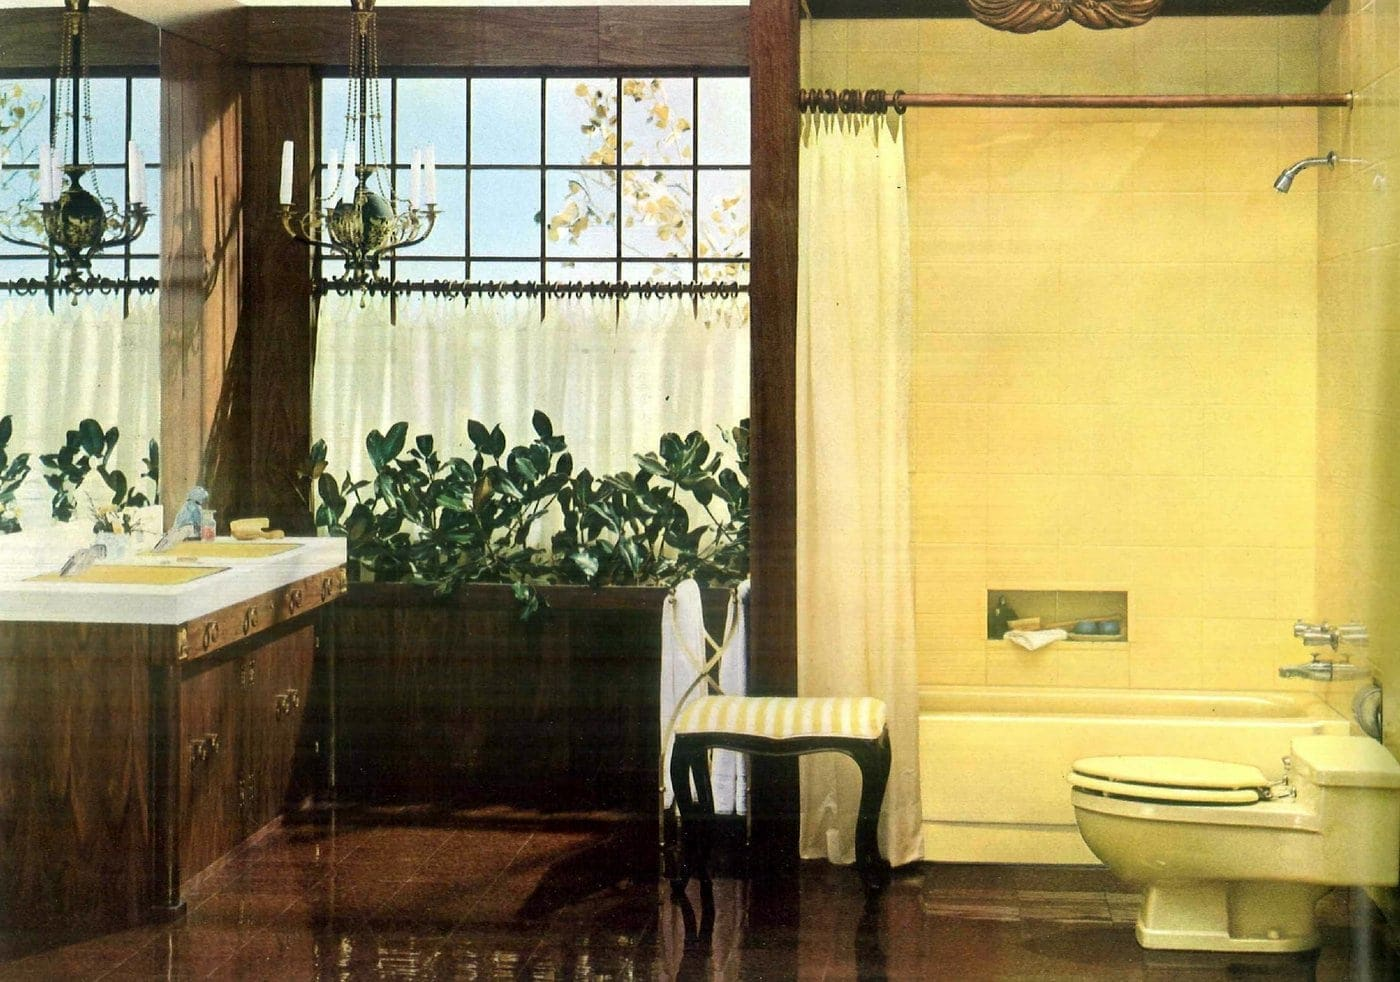 Sixties bathroom decorating ideas - 1960 (6)